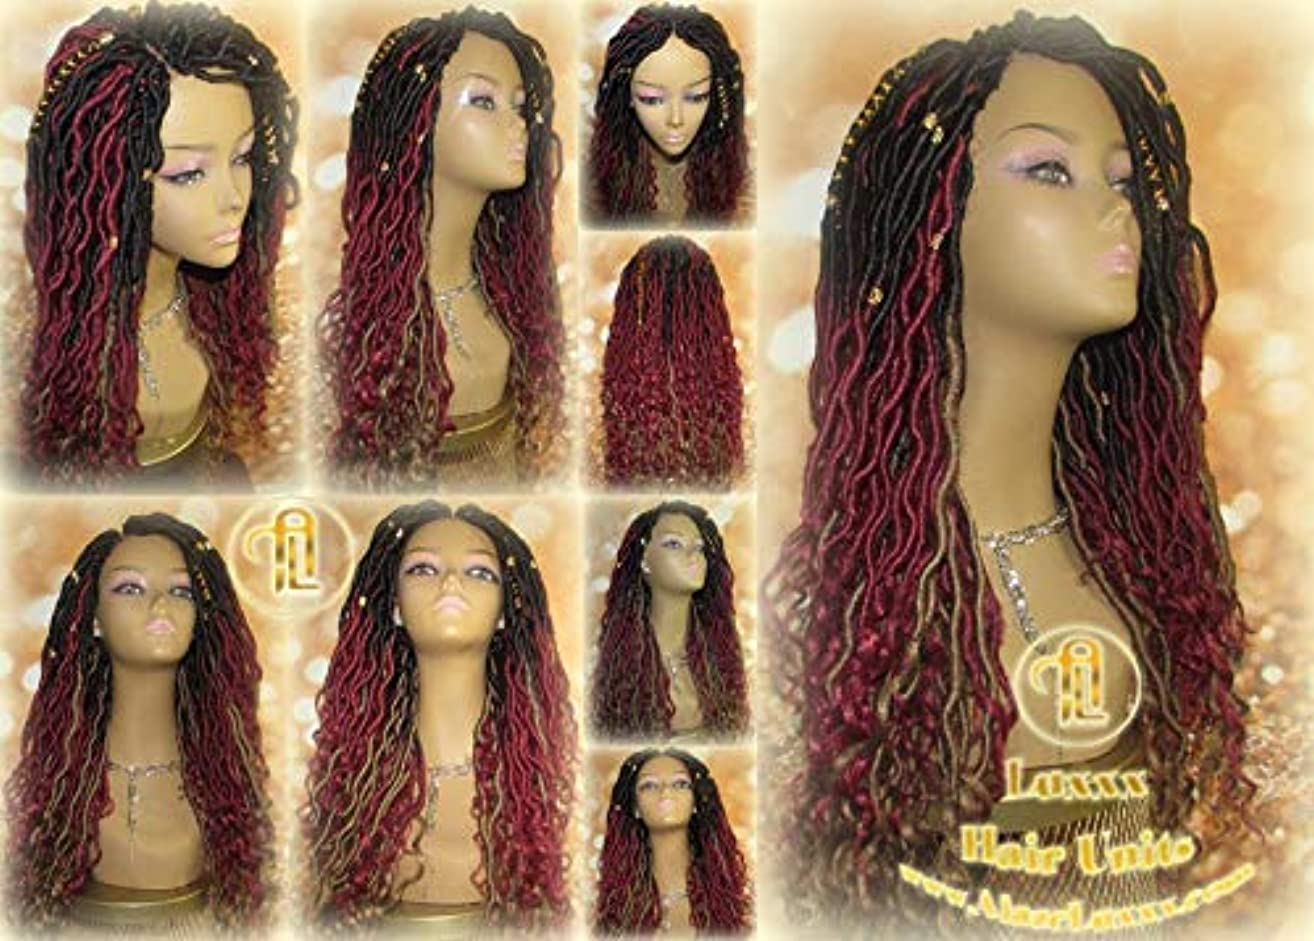 Dread Dred Loc Lock Wig Fire Goddess Red Burgundy Black530 Ombre 1b Blonde 27 Marley Goddess Crochet Synthetic Unit Hair Braided Wavy